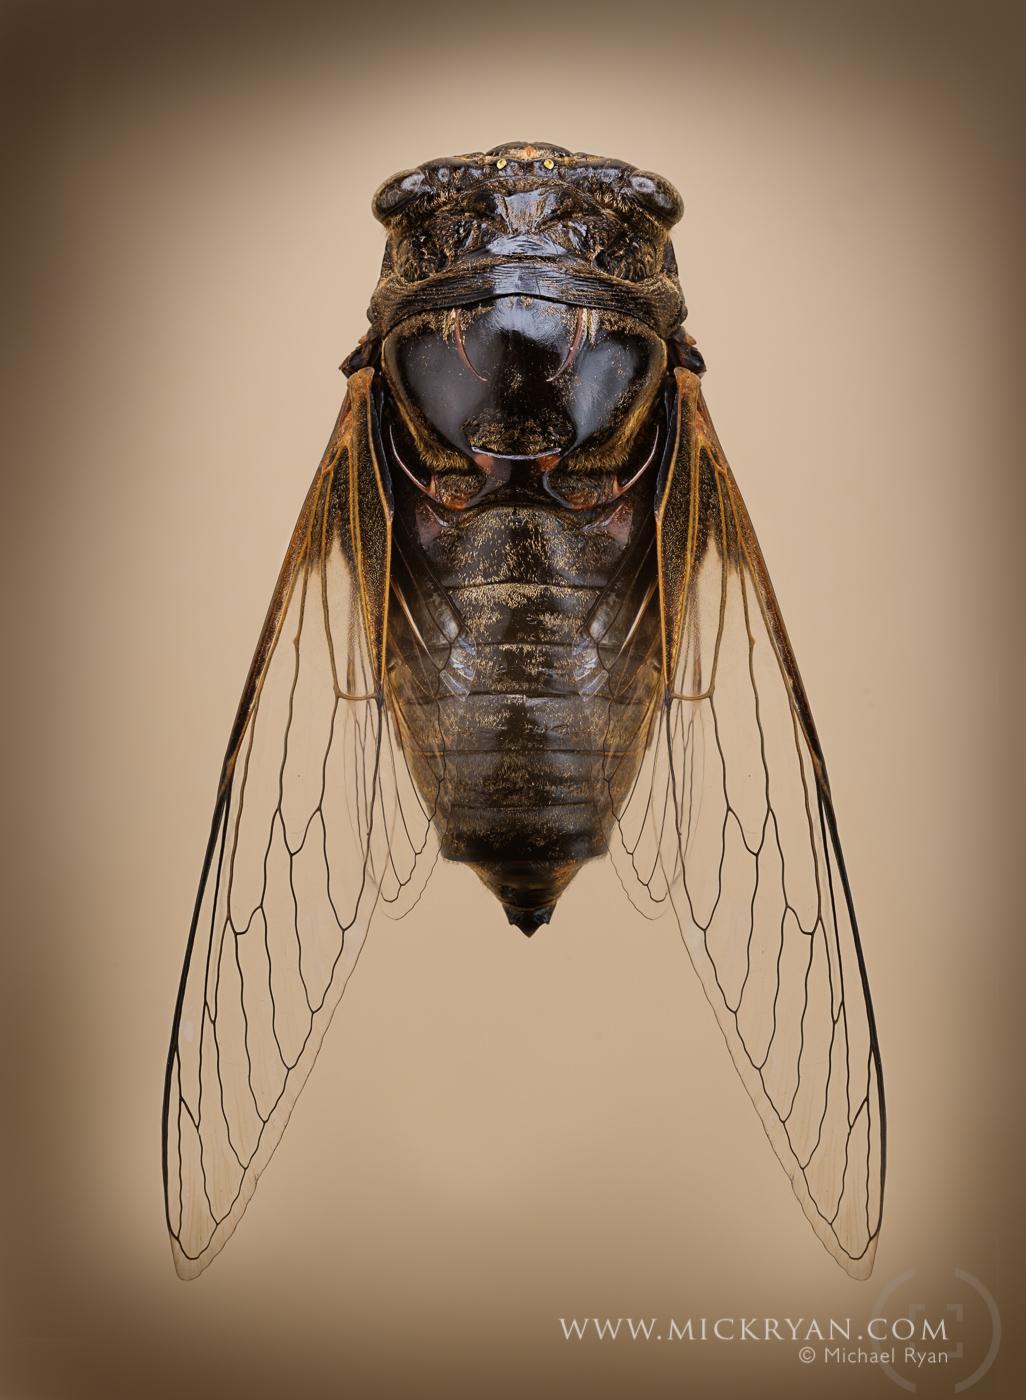 Cicada wings spread-3195-Edit.jpg